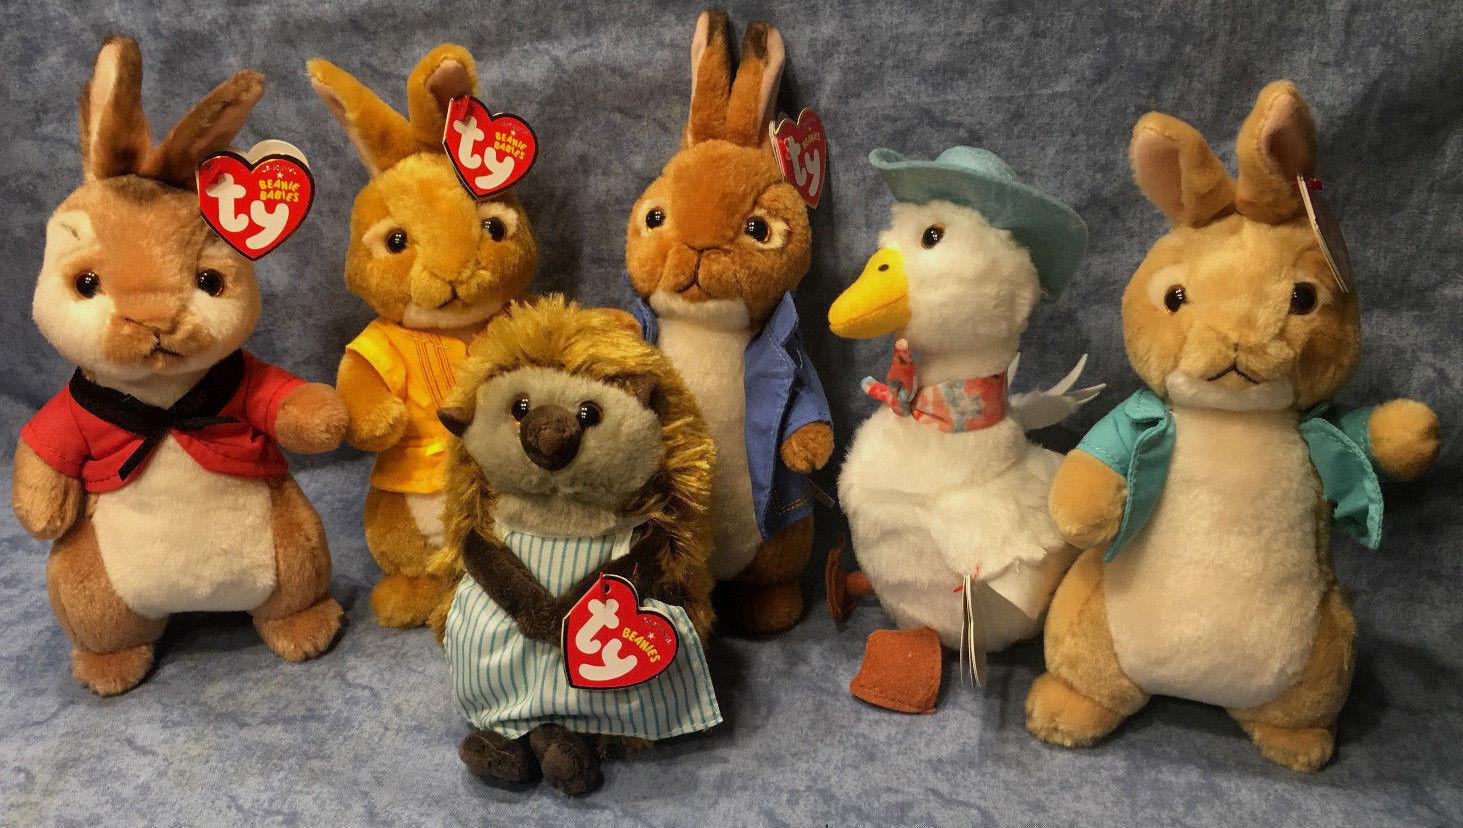 W-f-l TY Peter Rabbit der LEPRE SCELTA TV CINEMA 15 cm Peluche Jemima RICCIO OCA